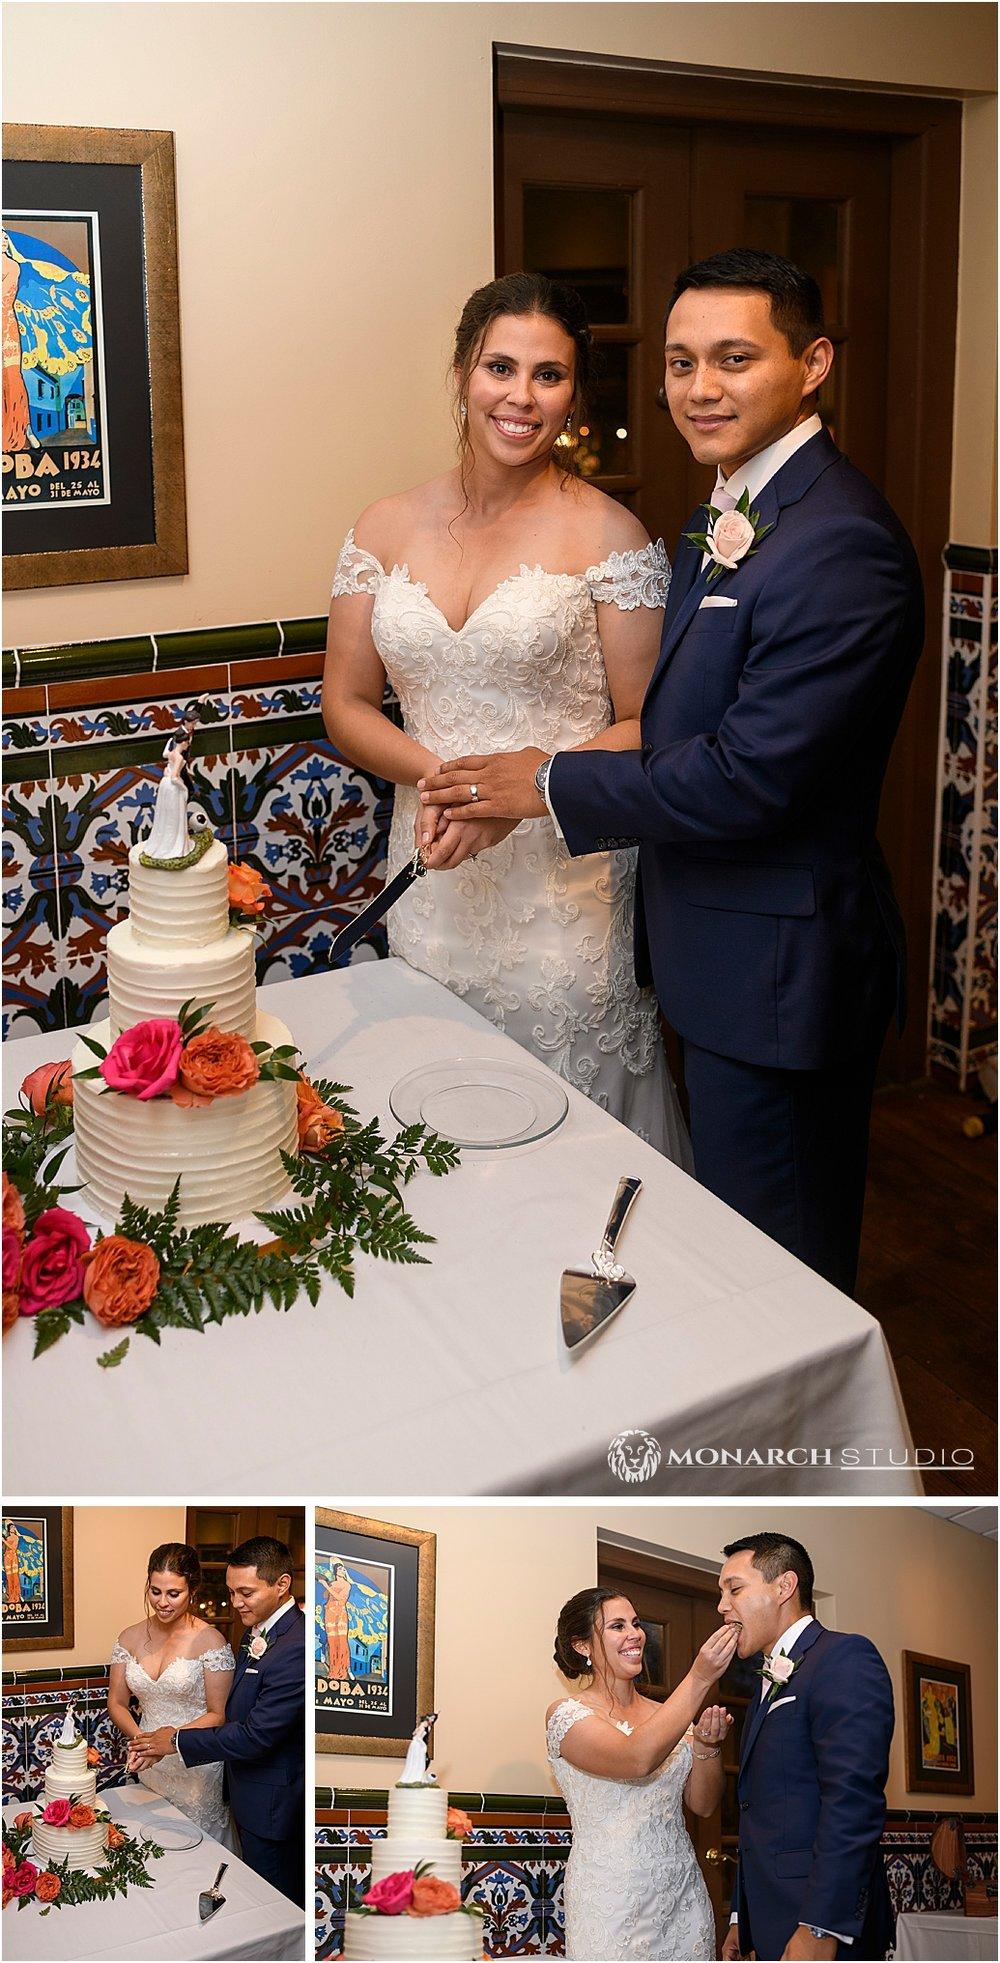 st-augustine-catholic-wedding-076.jpg